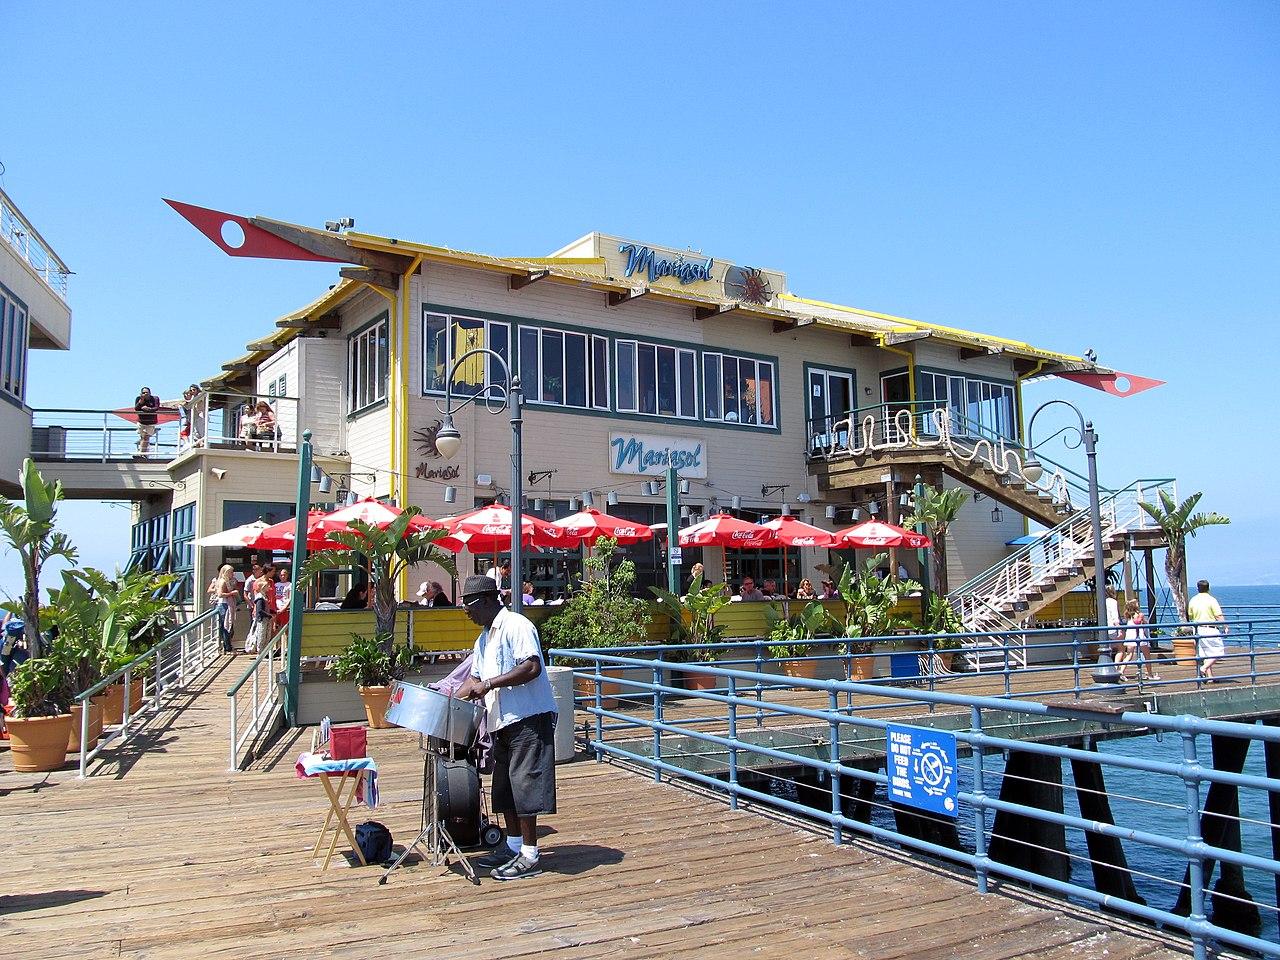 Santa Monica Restaurant By The Beach